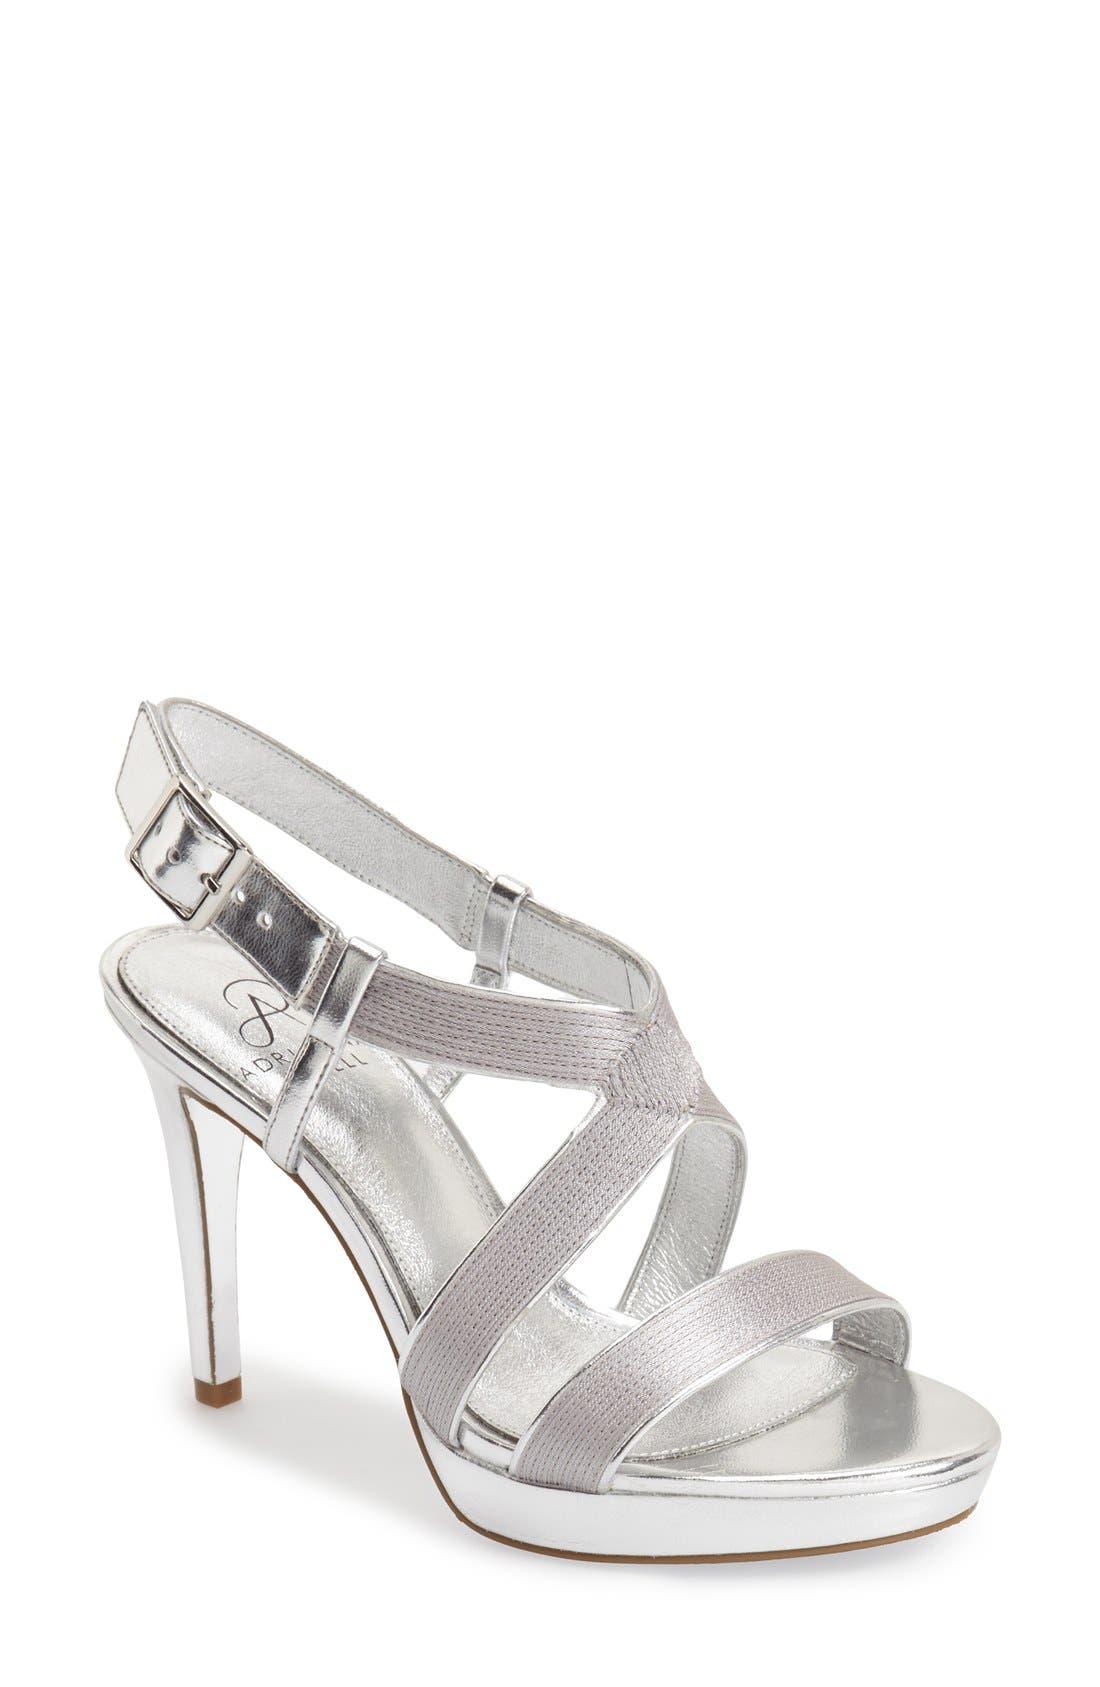 Main Image - Adrianna Papell 'Anette' Platform Sandal (Women)